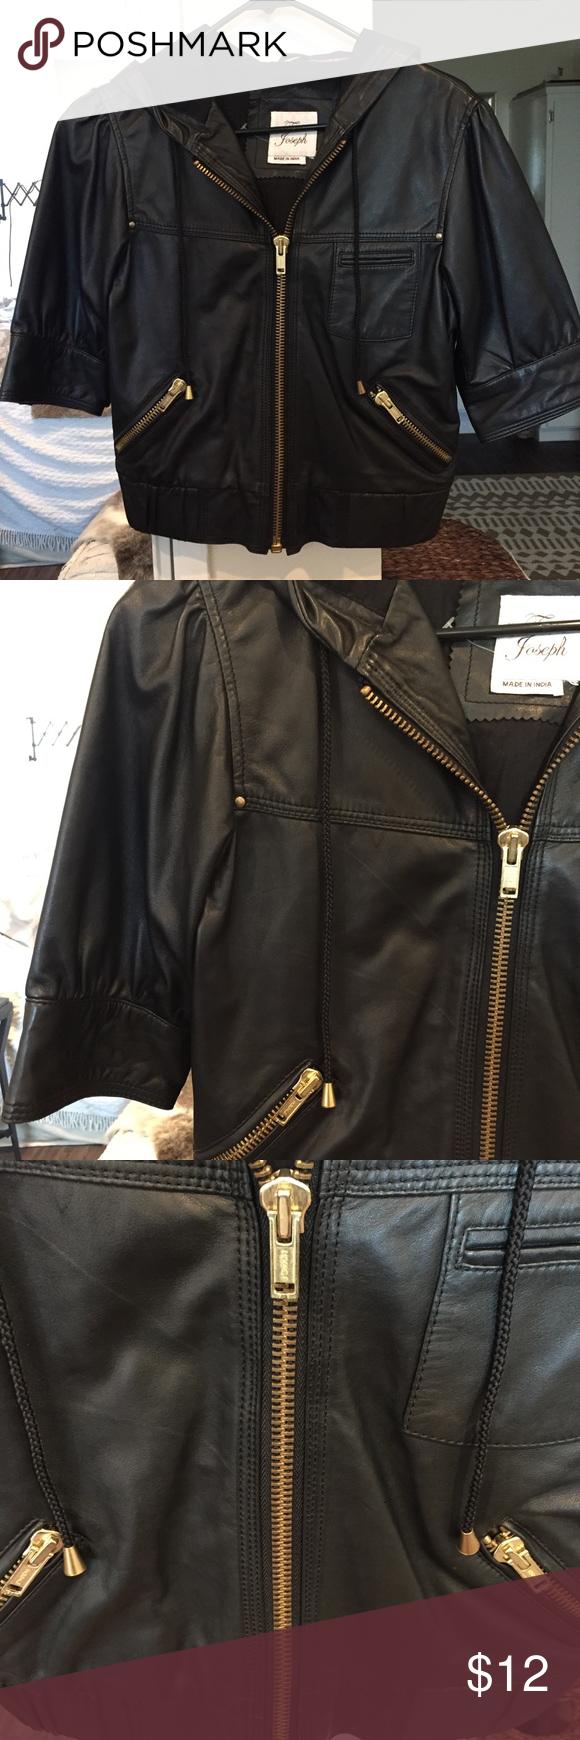 Genuine Leather jacket Soft genuine leather jacket with